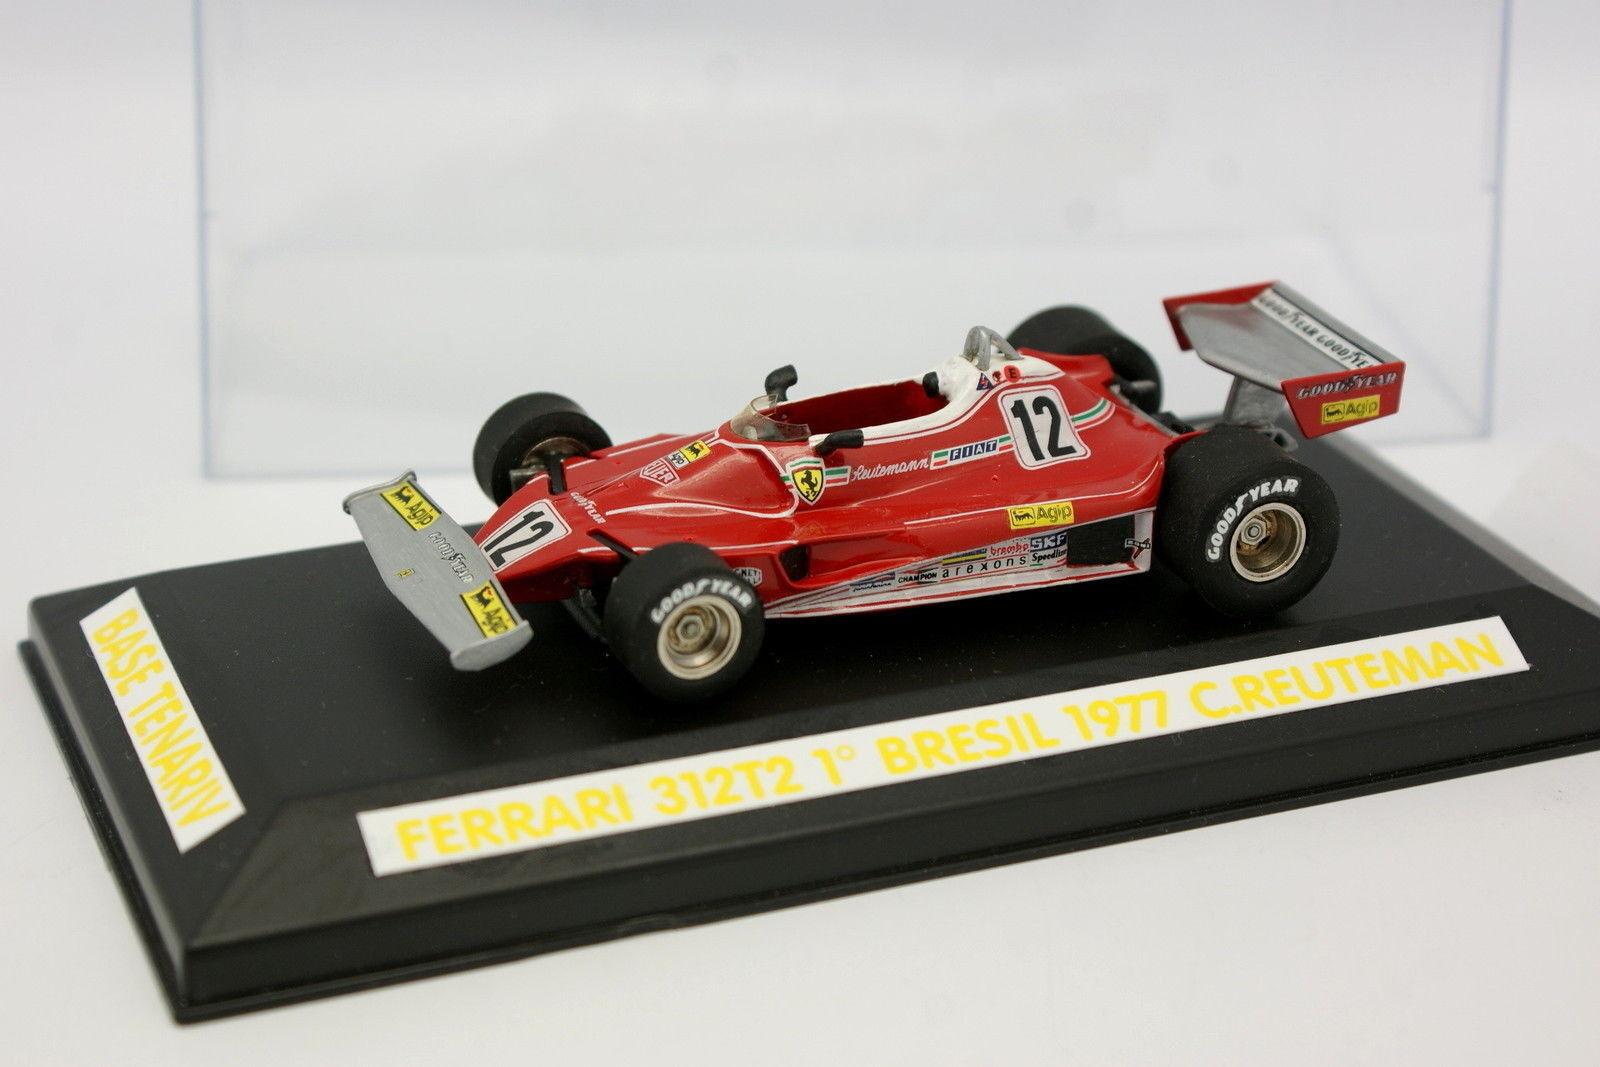 Tenariv Set Built 1 43 - F1 Ferrari 312 T2 Winner Brazil GP 1977 Reuteman